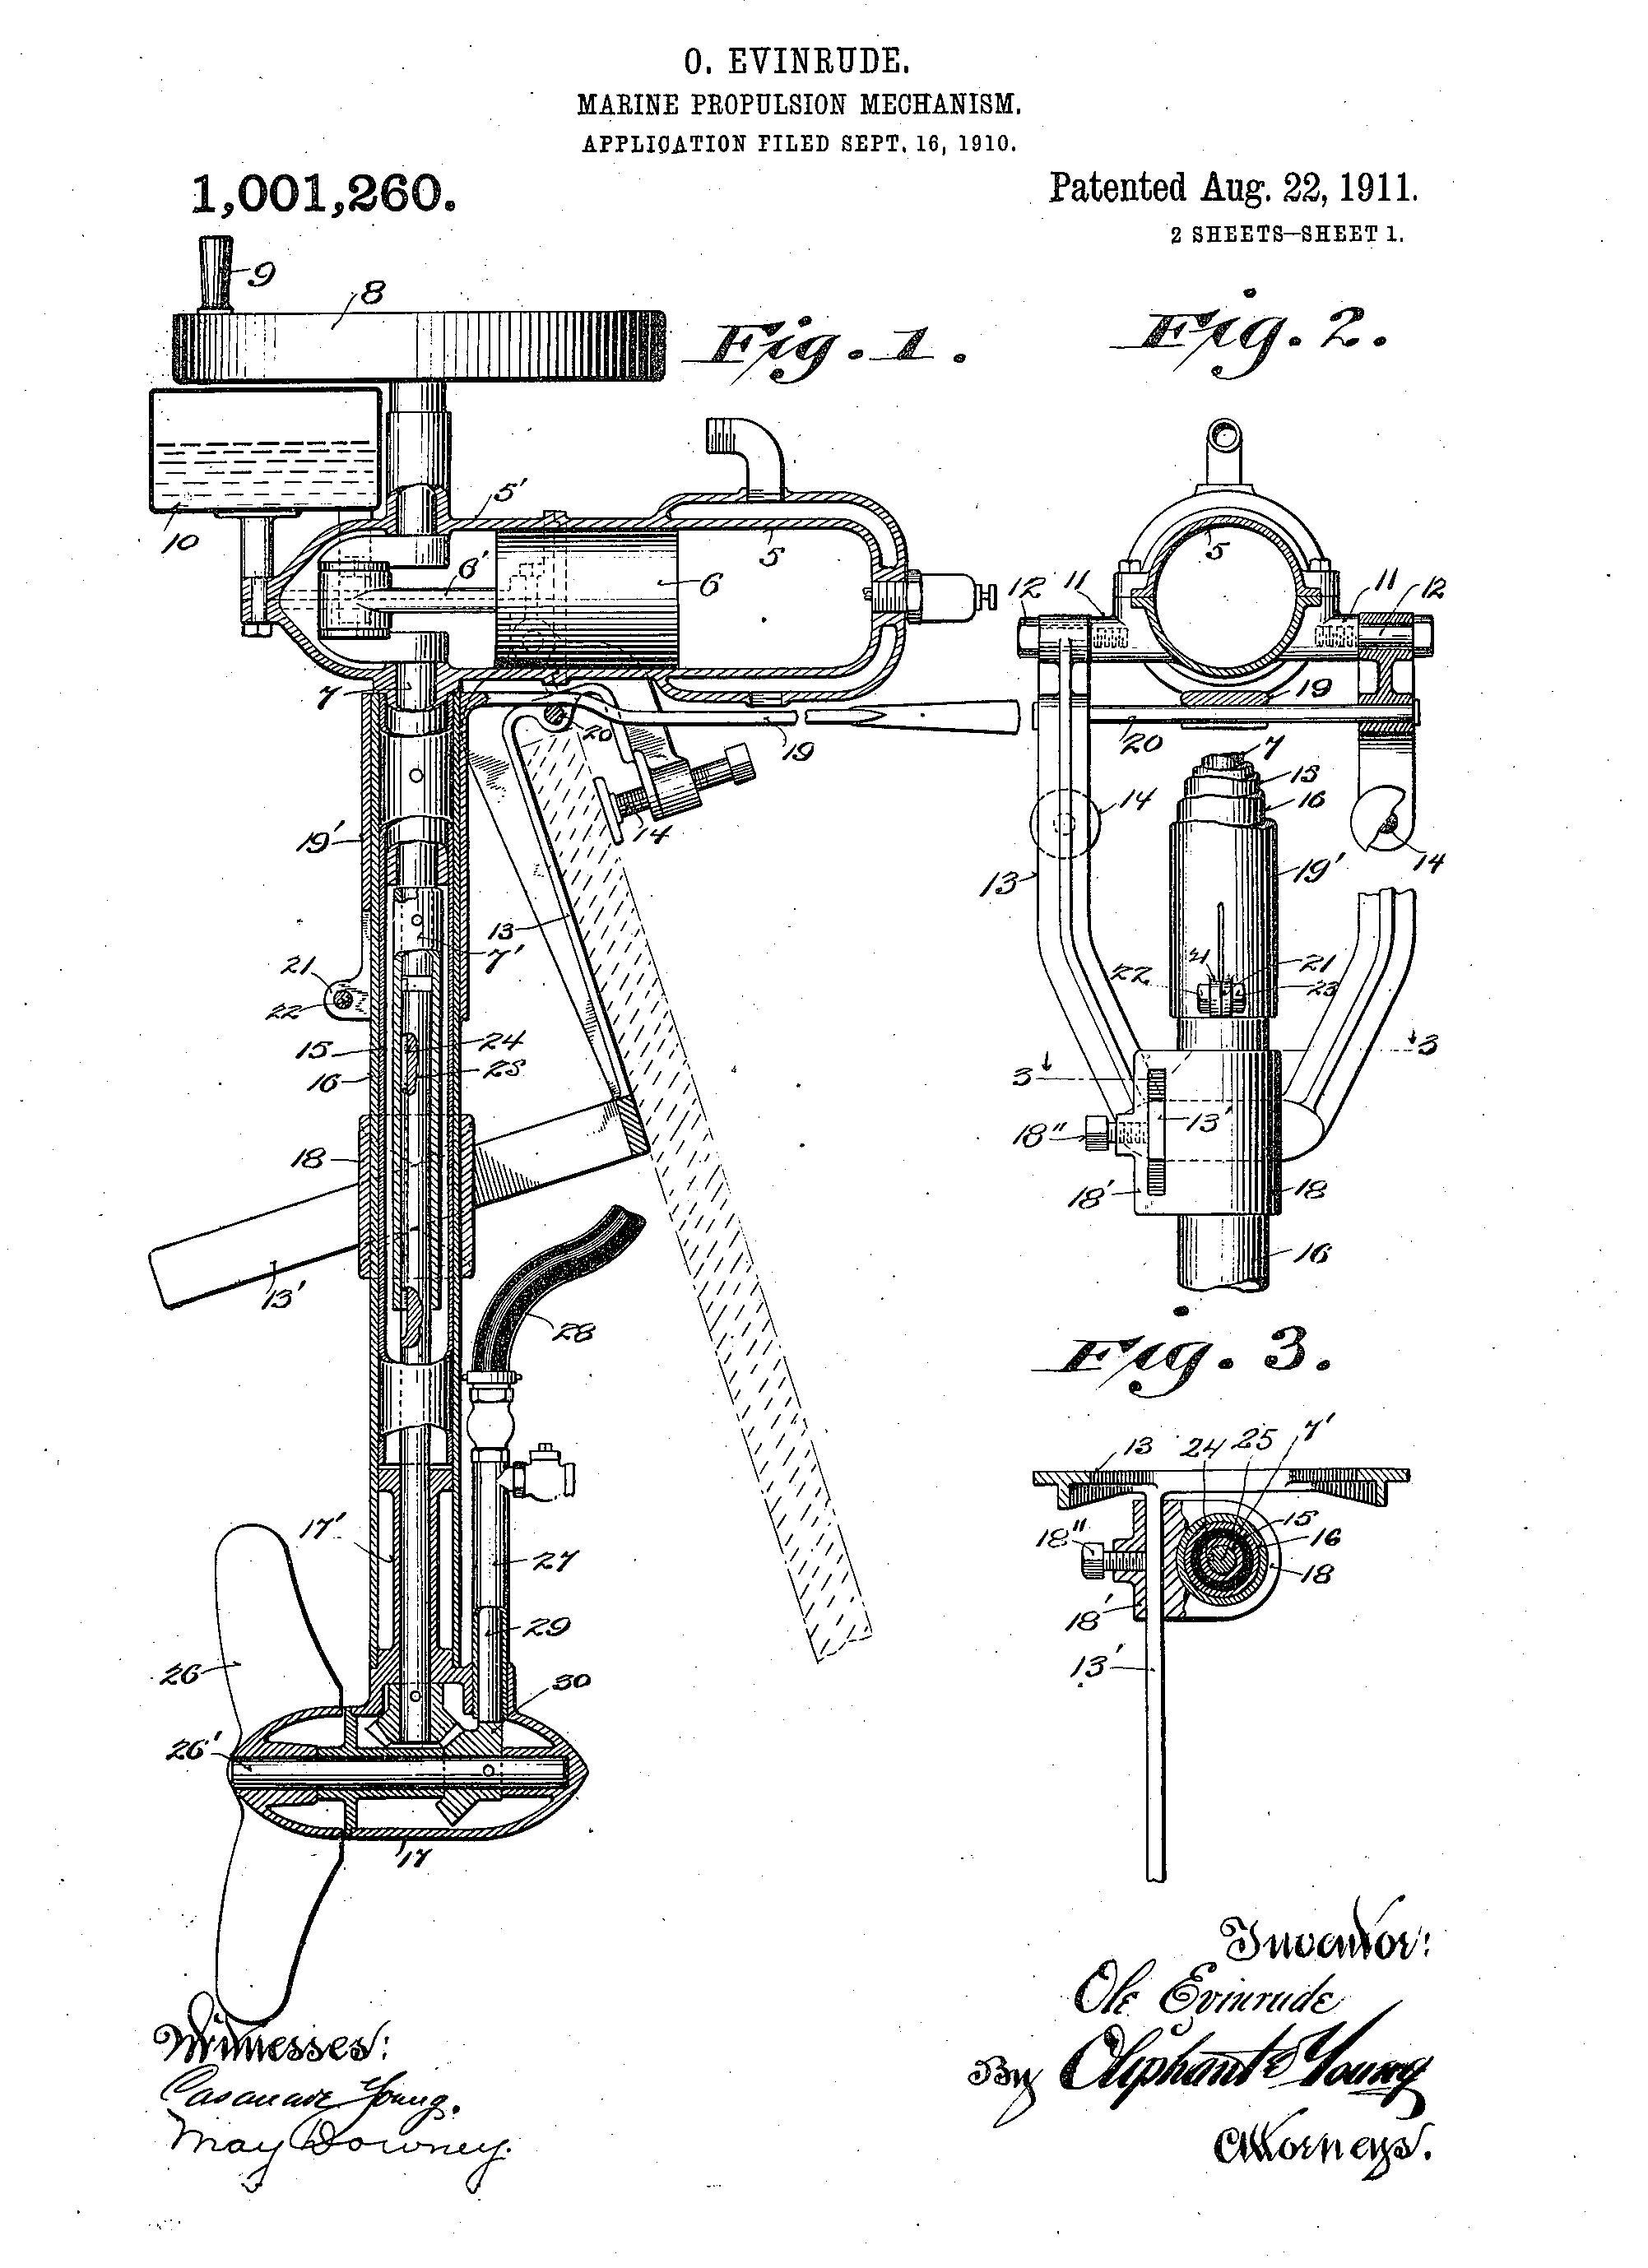 evinrude boat motor wiring diagrams